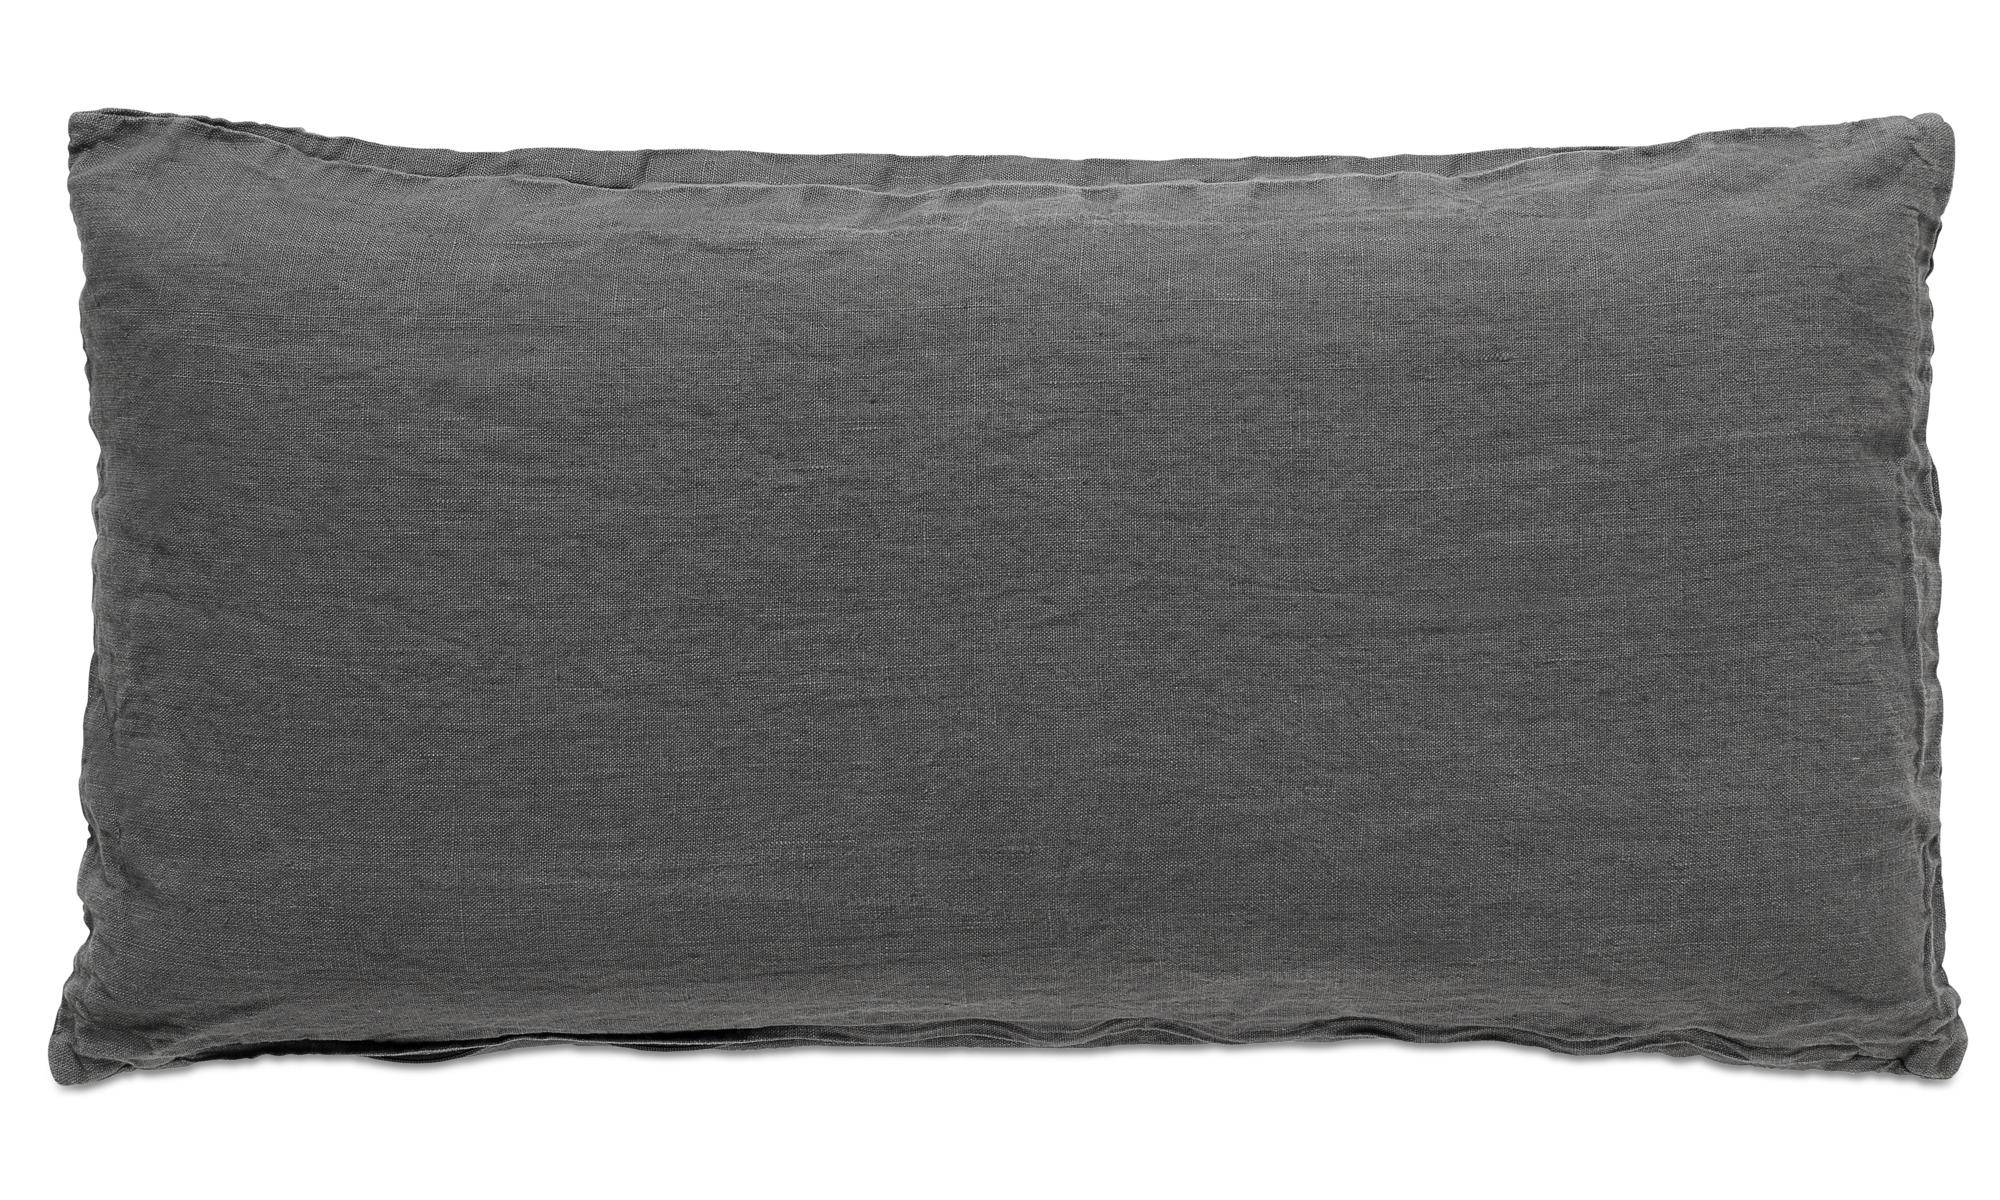 Cushions - Linen washed cushion - Grey - Fabric